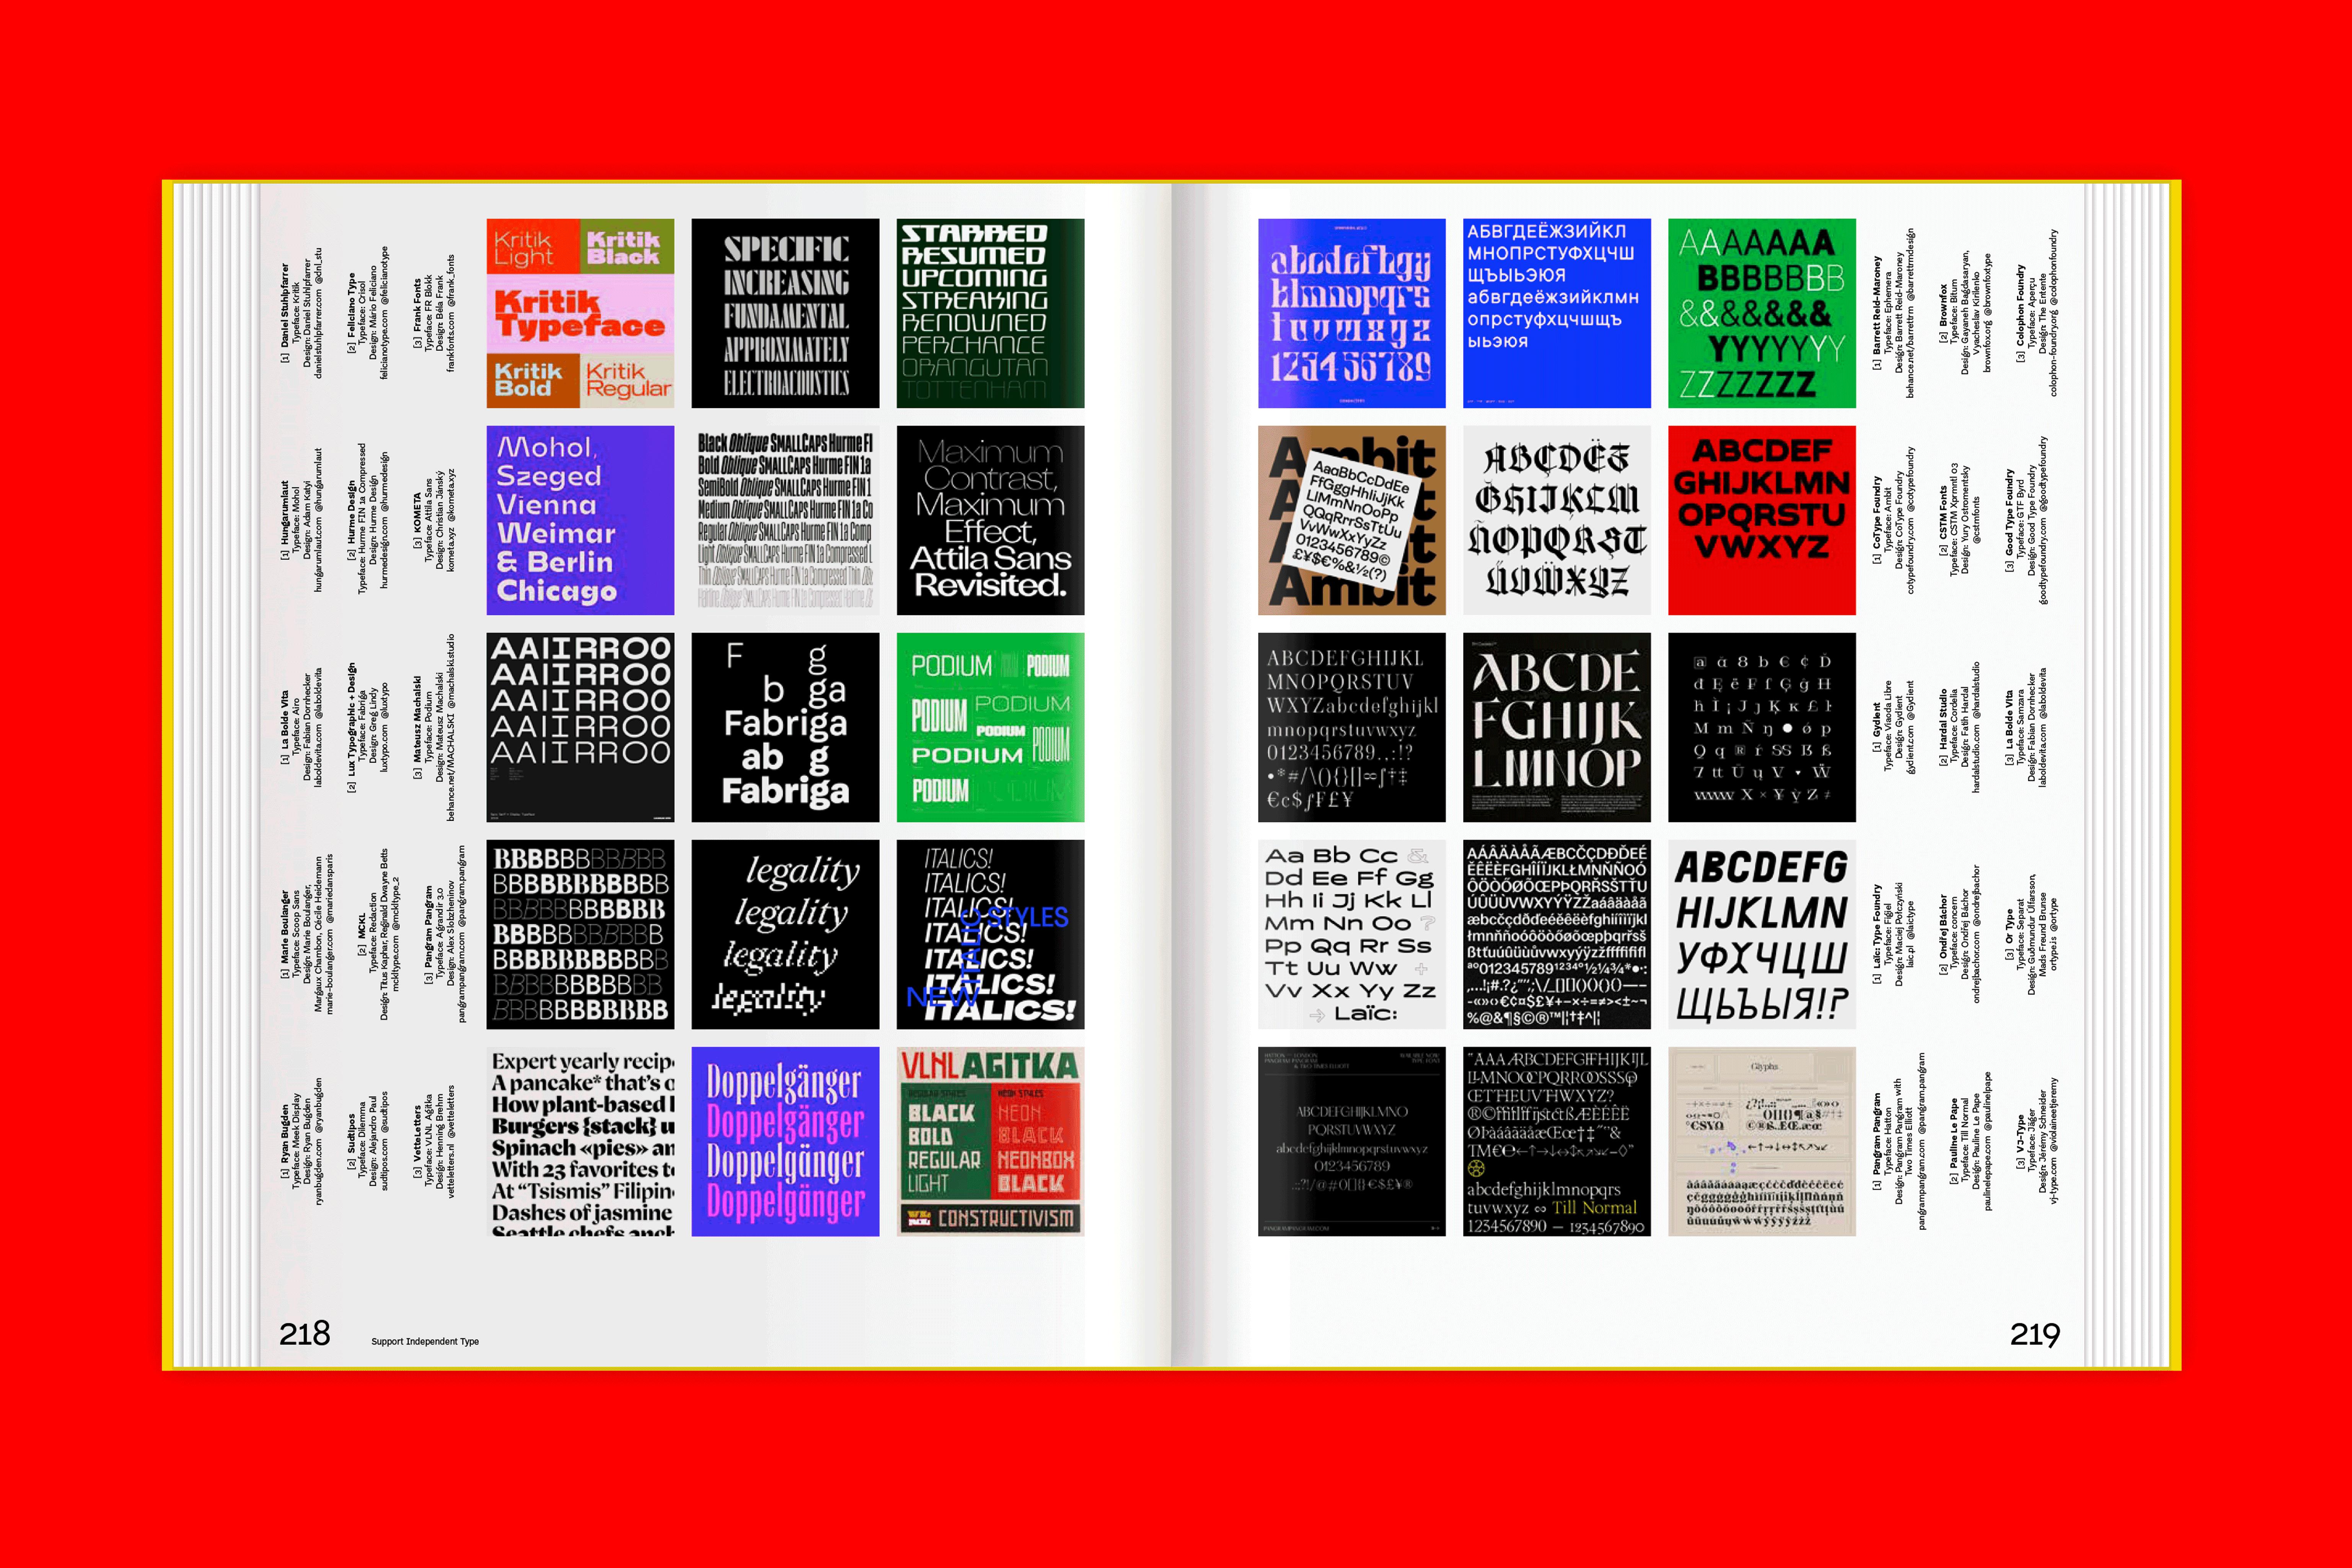 Slanted-Publiaktionen-Slanted-Publishers-Support-Independent-Type_28